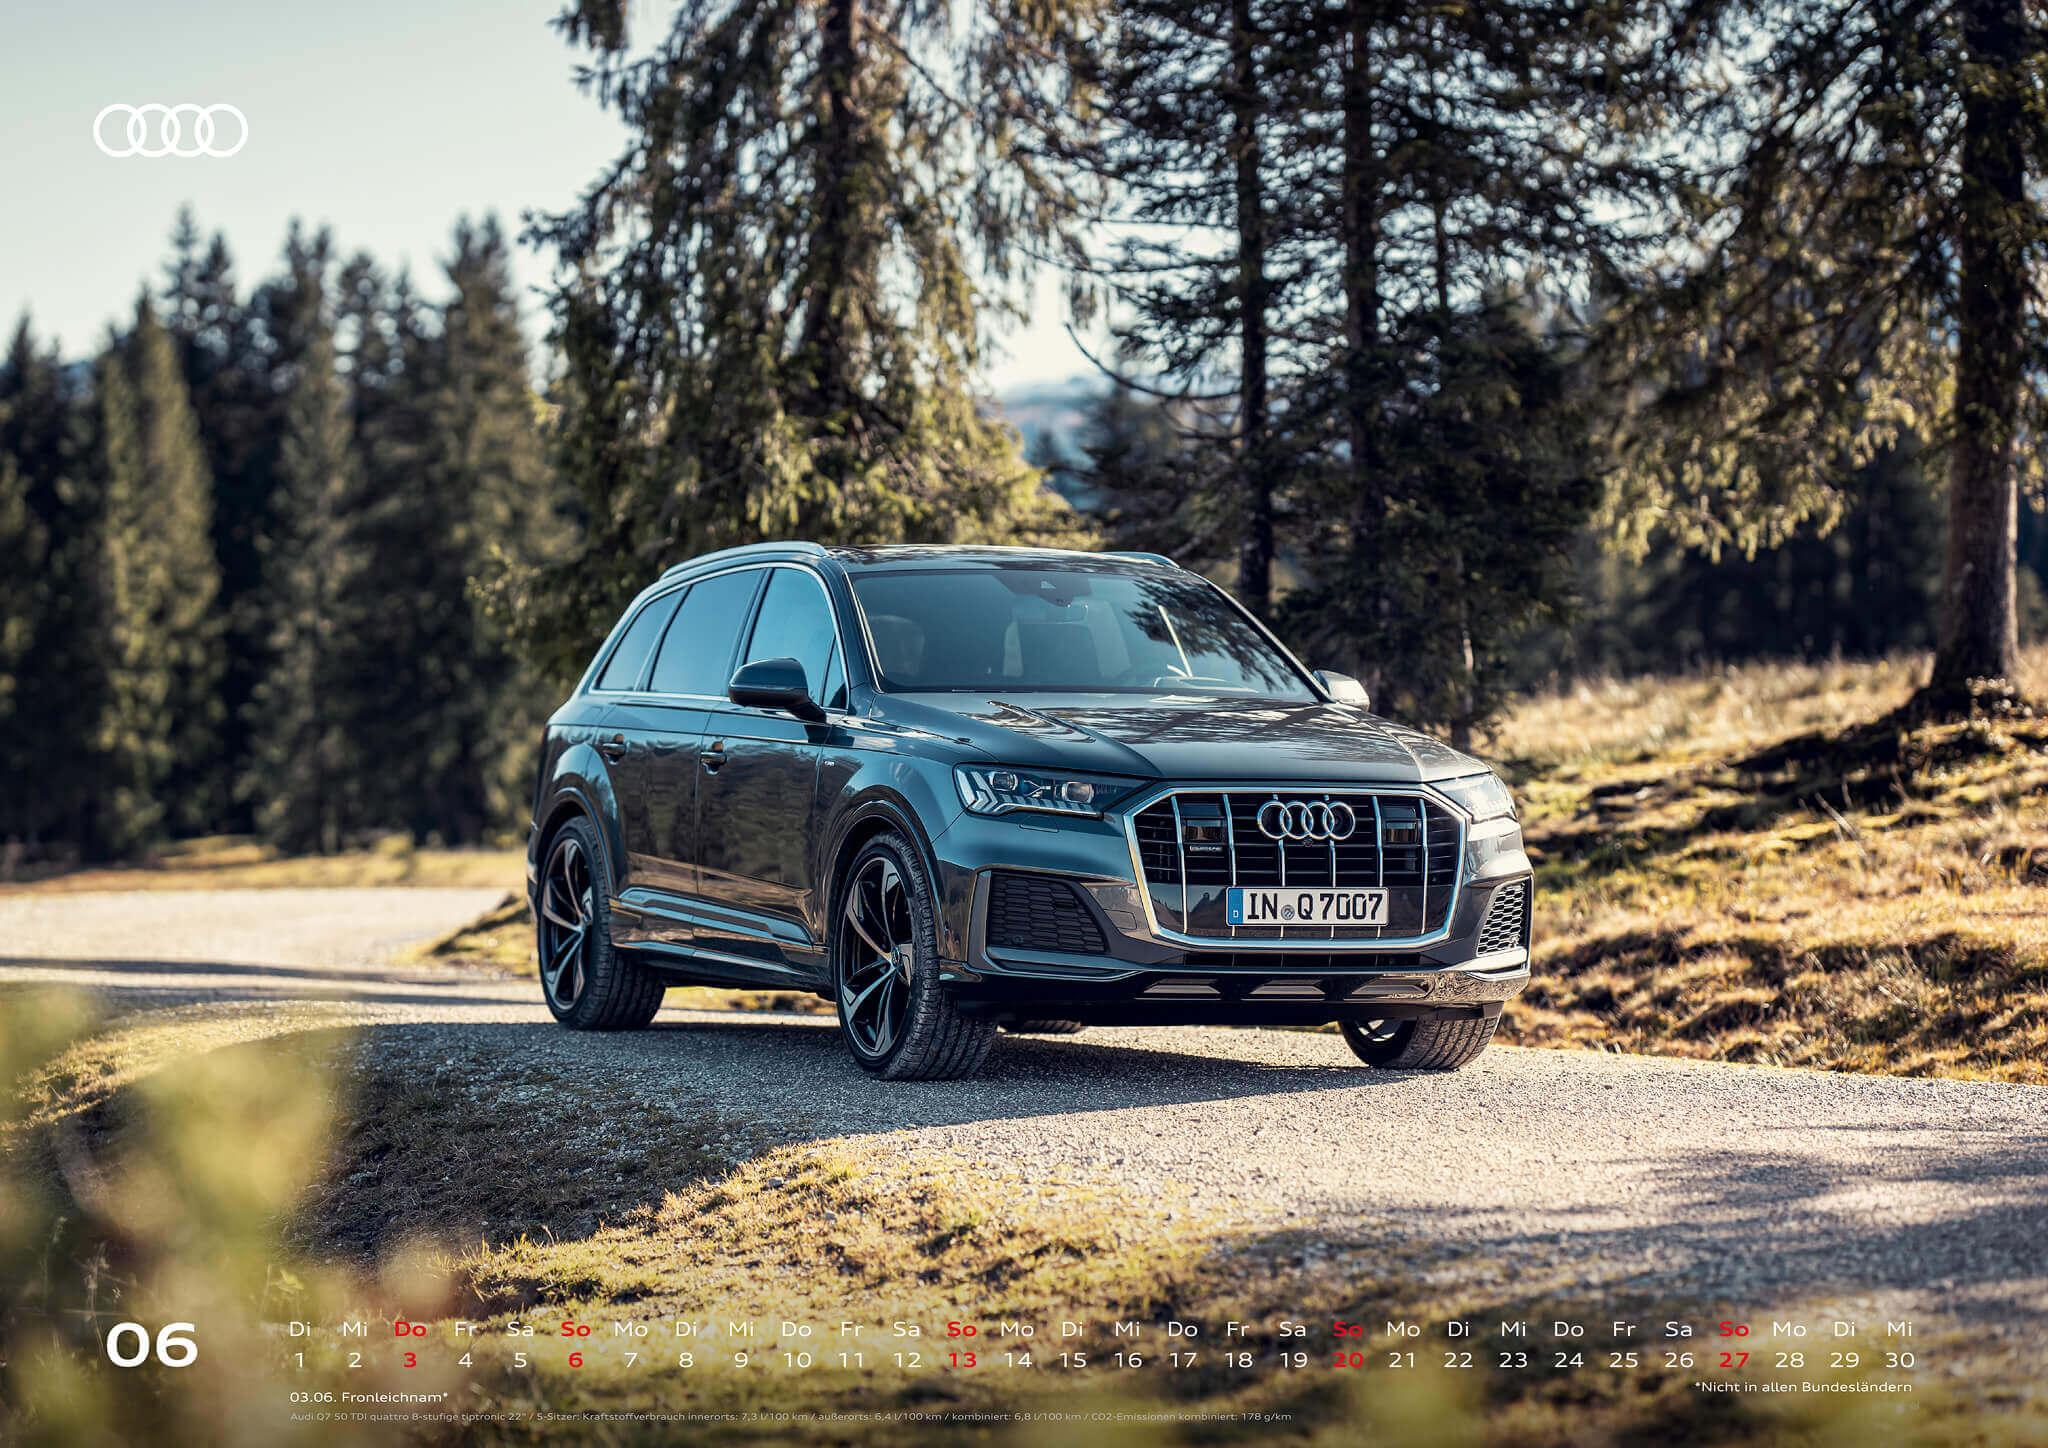 Audi Kalender 2021 - DIN A2 / Audi Q7